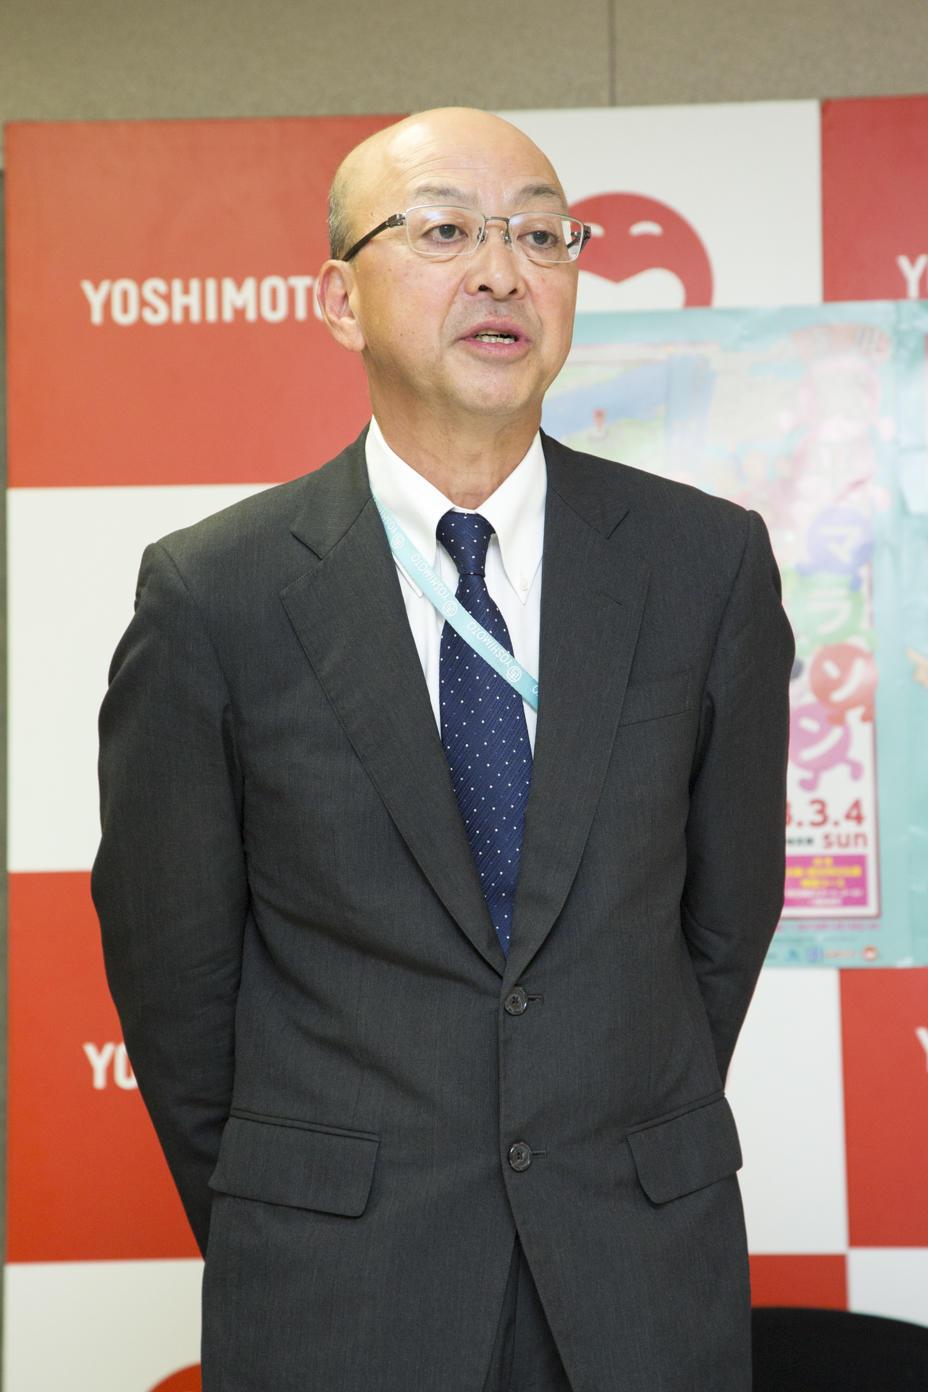 http://news.yoshimoto.co.jp/20170830175144-a8297b191dd0265182fcca9f4608252f135567af.jpg